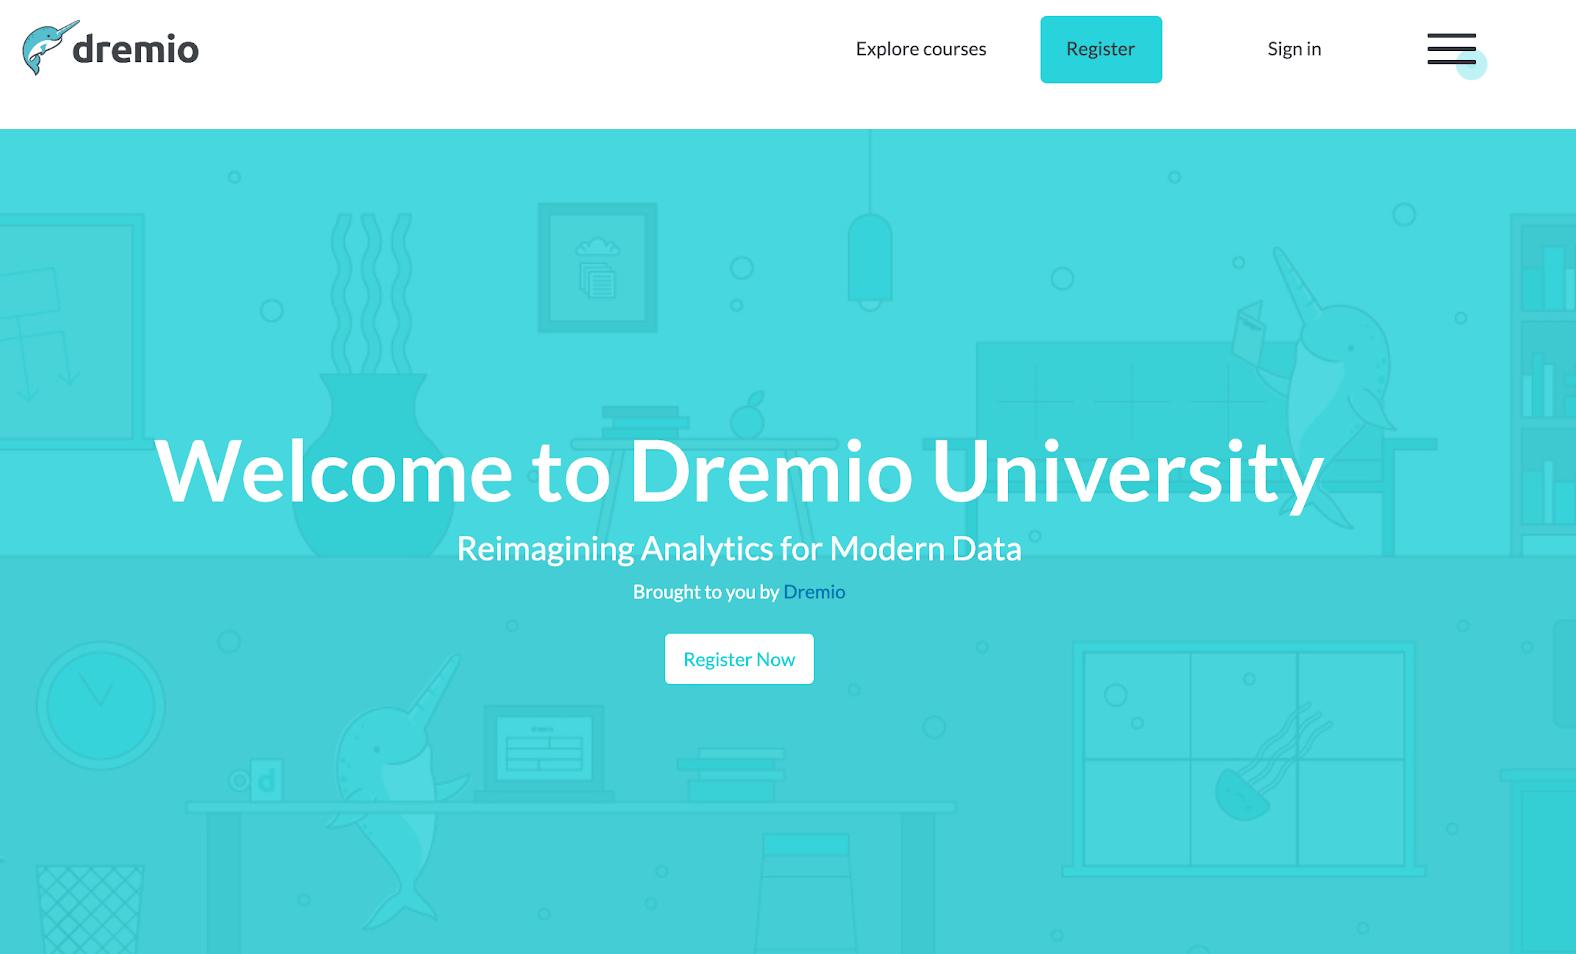 dremio using virtual training labs